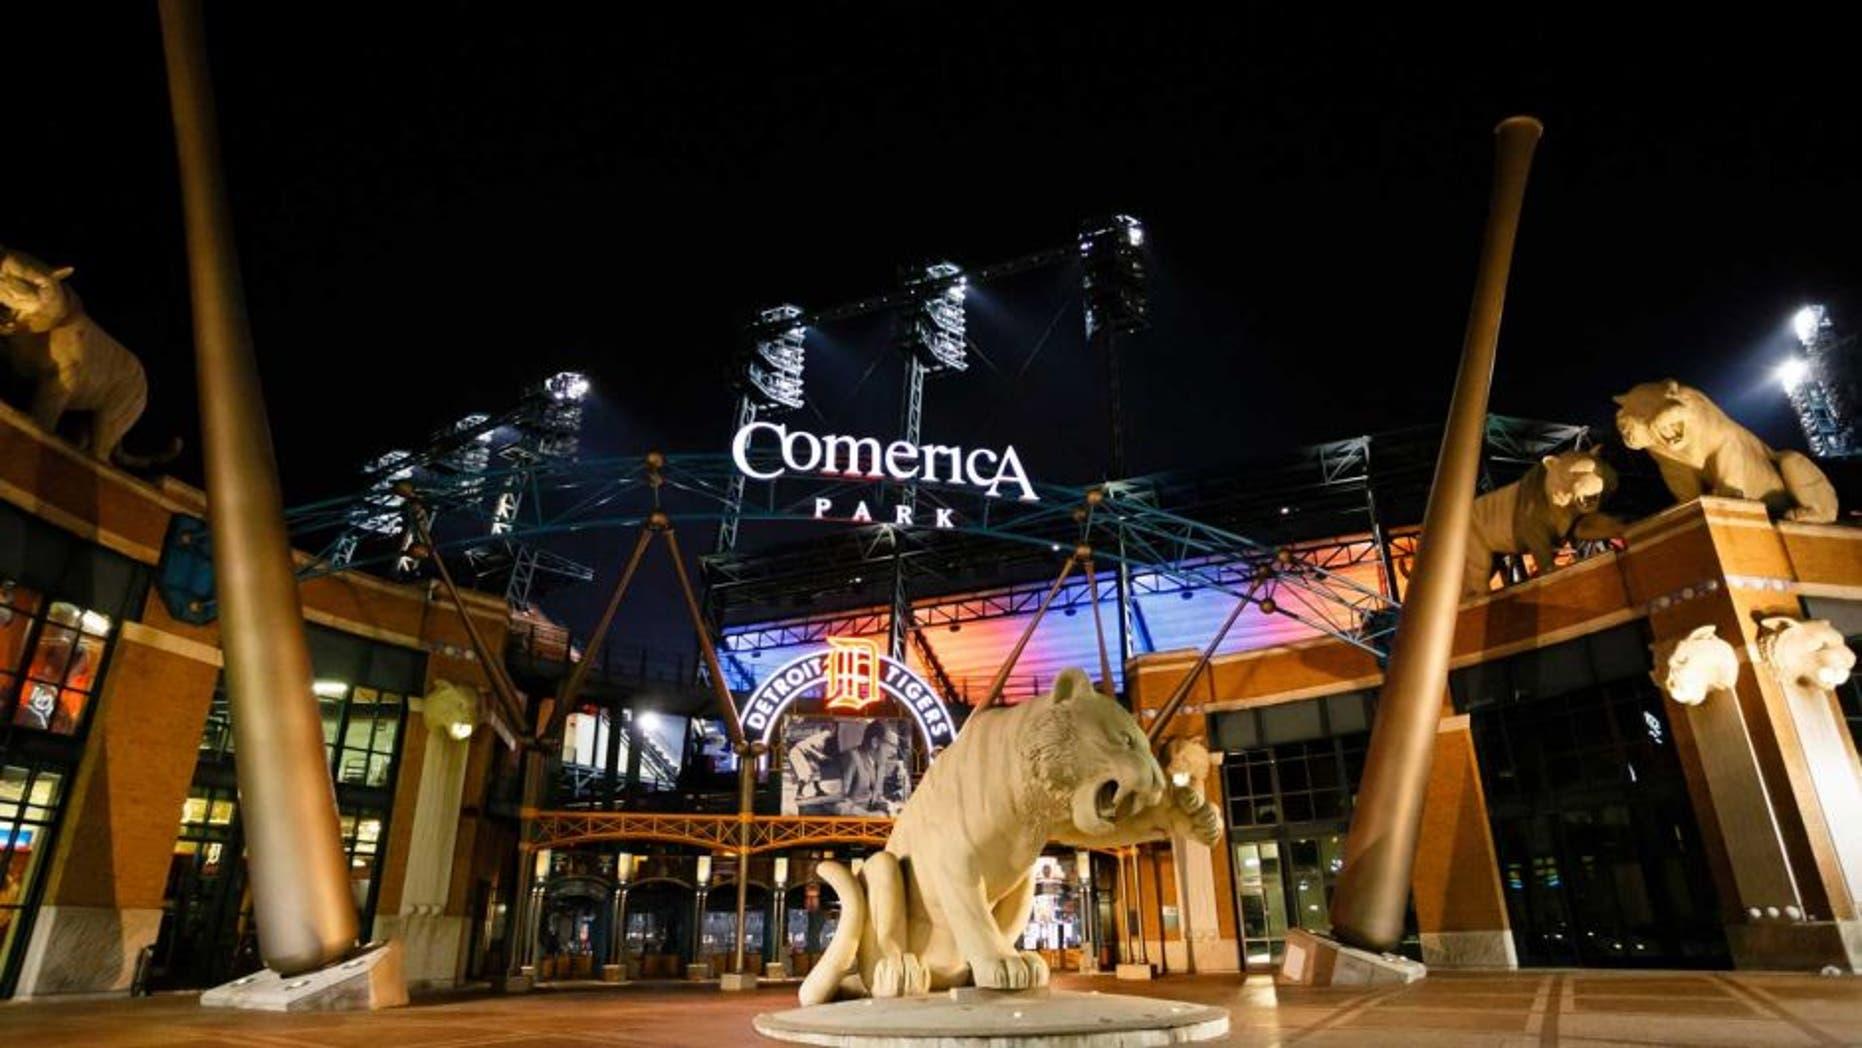 April 30, 2013; Detroit, MI, USA; General view of exterior at night of Comerica Park. Mandatory Credit: Rick Osentoski-USA TODAY Sports